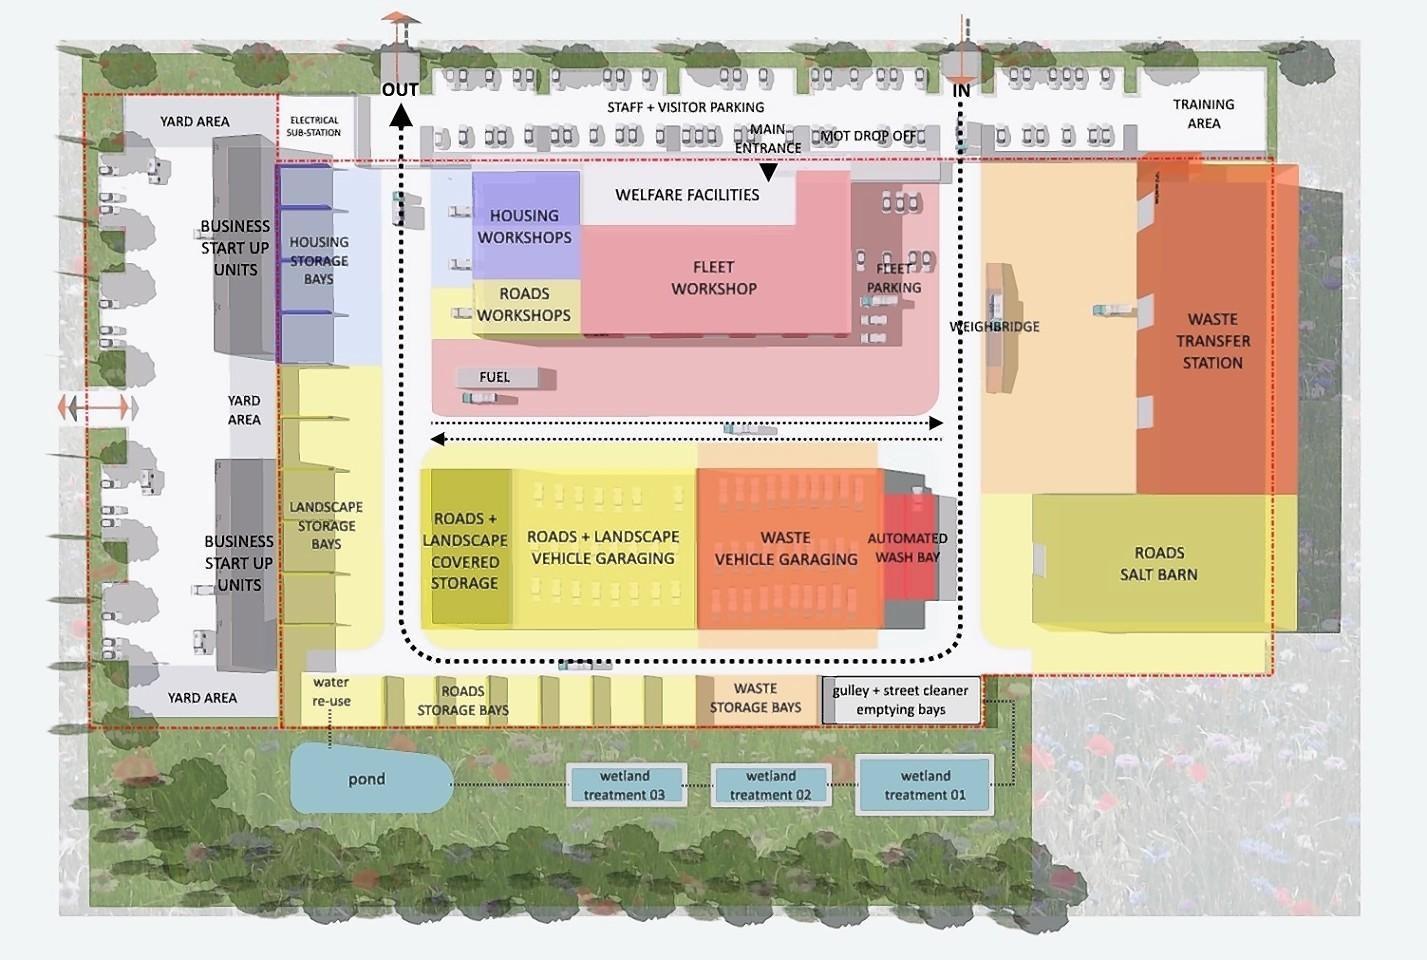 Council depot plans for Stonehaven